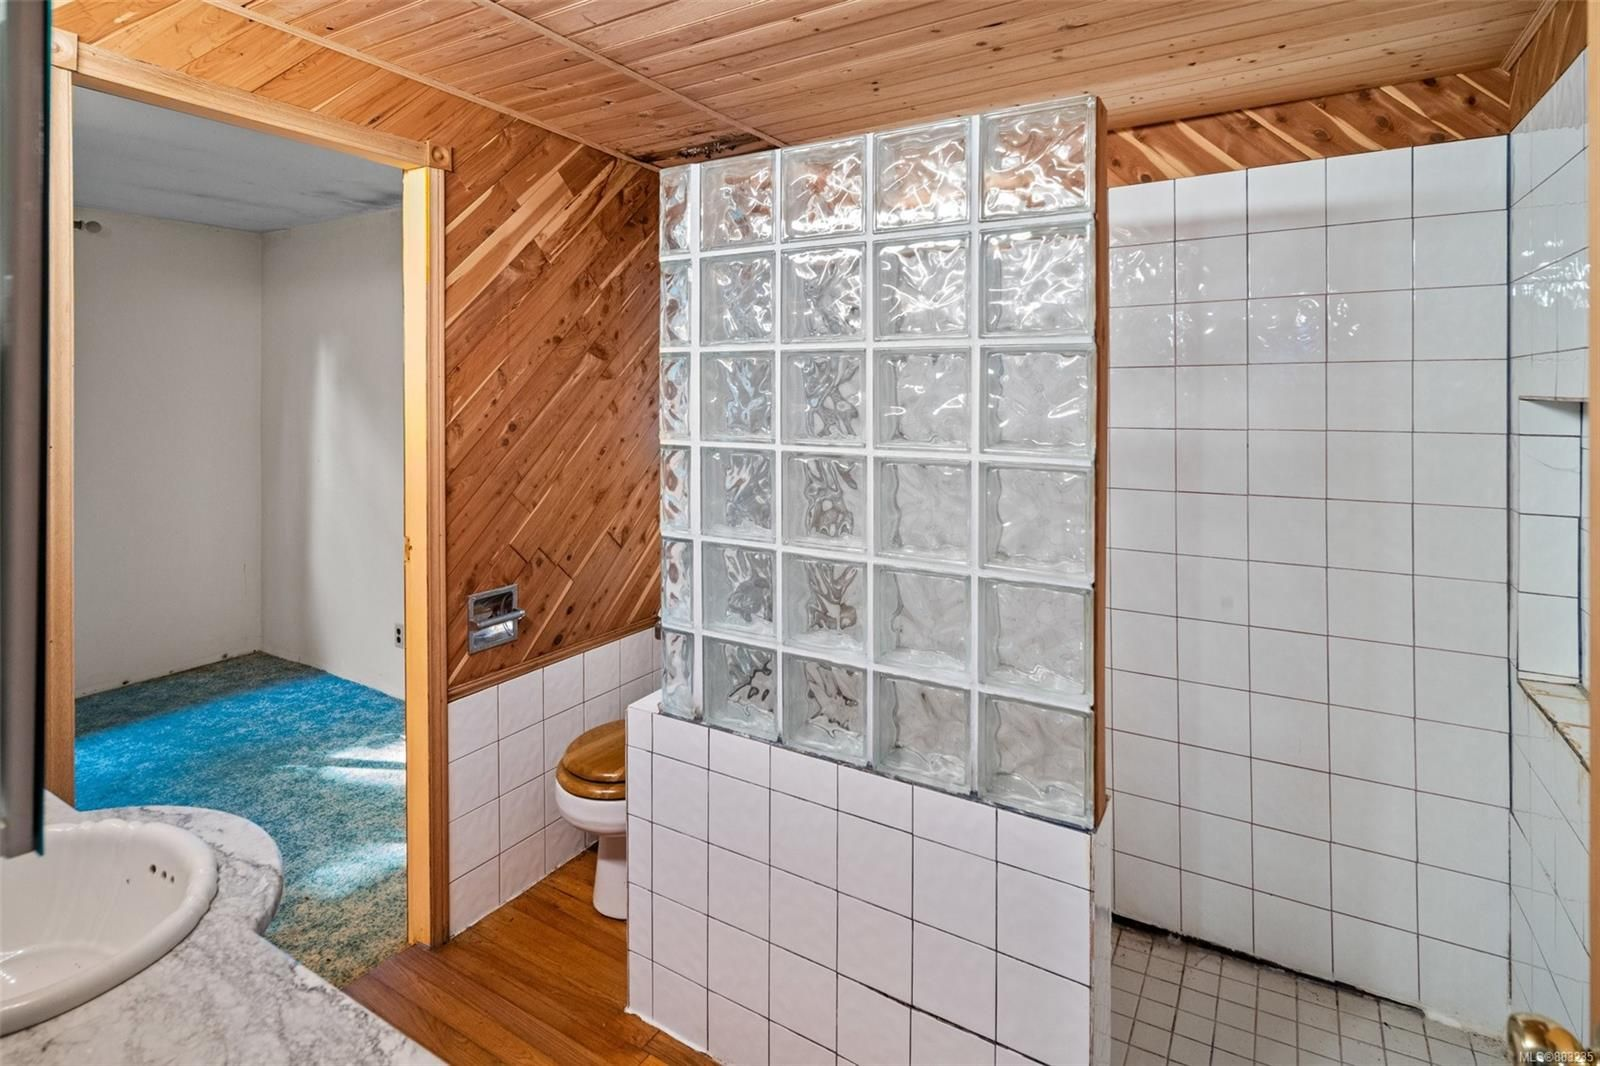 Photo 26: Photos: 6542 Thornett Rd in : Sk East Sooke House for sale (Sooke)  : MLS®# 883235